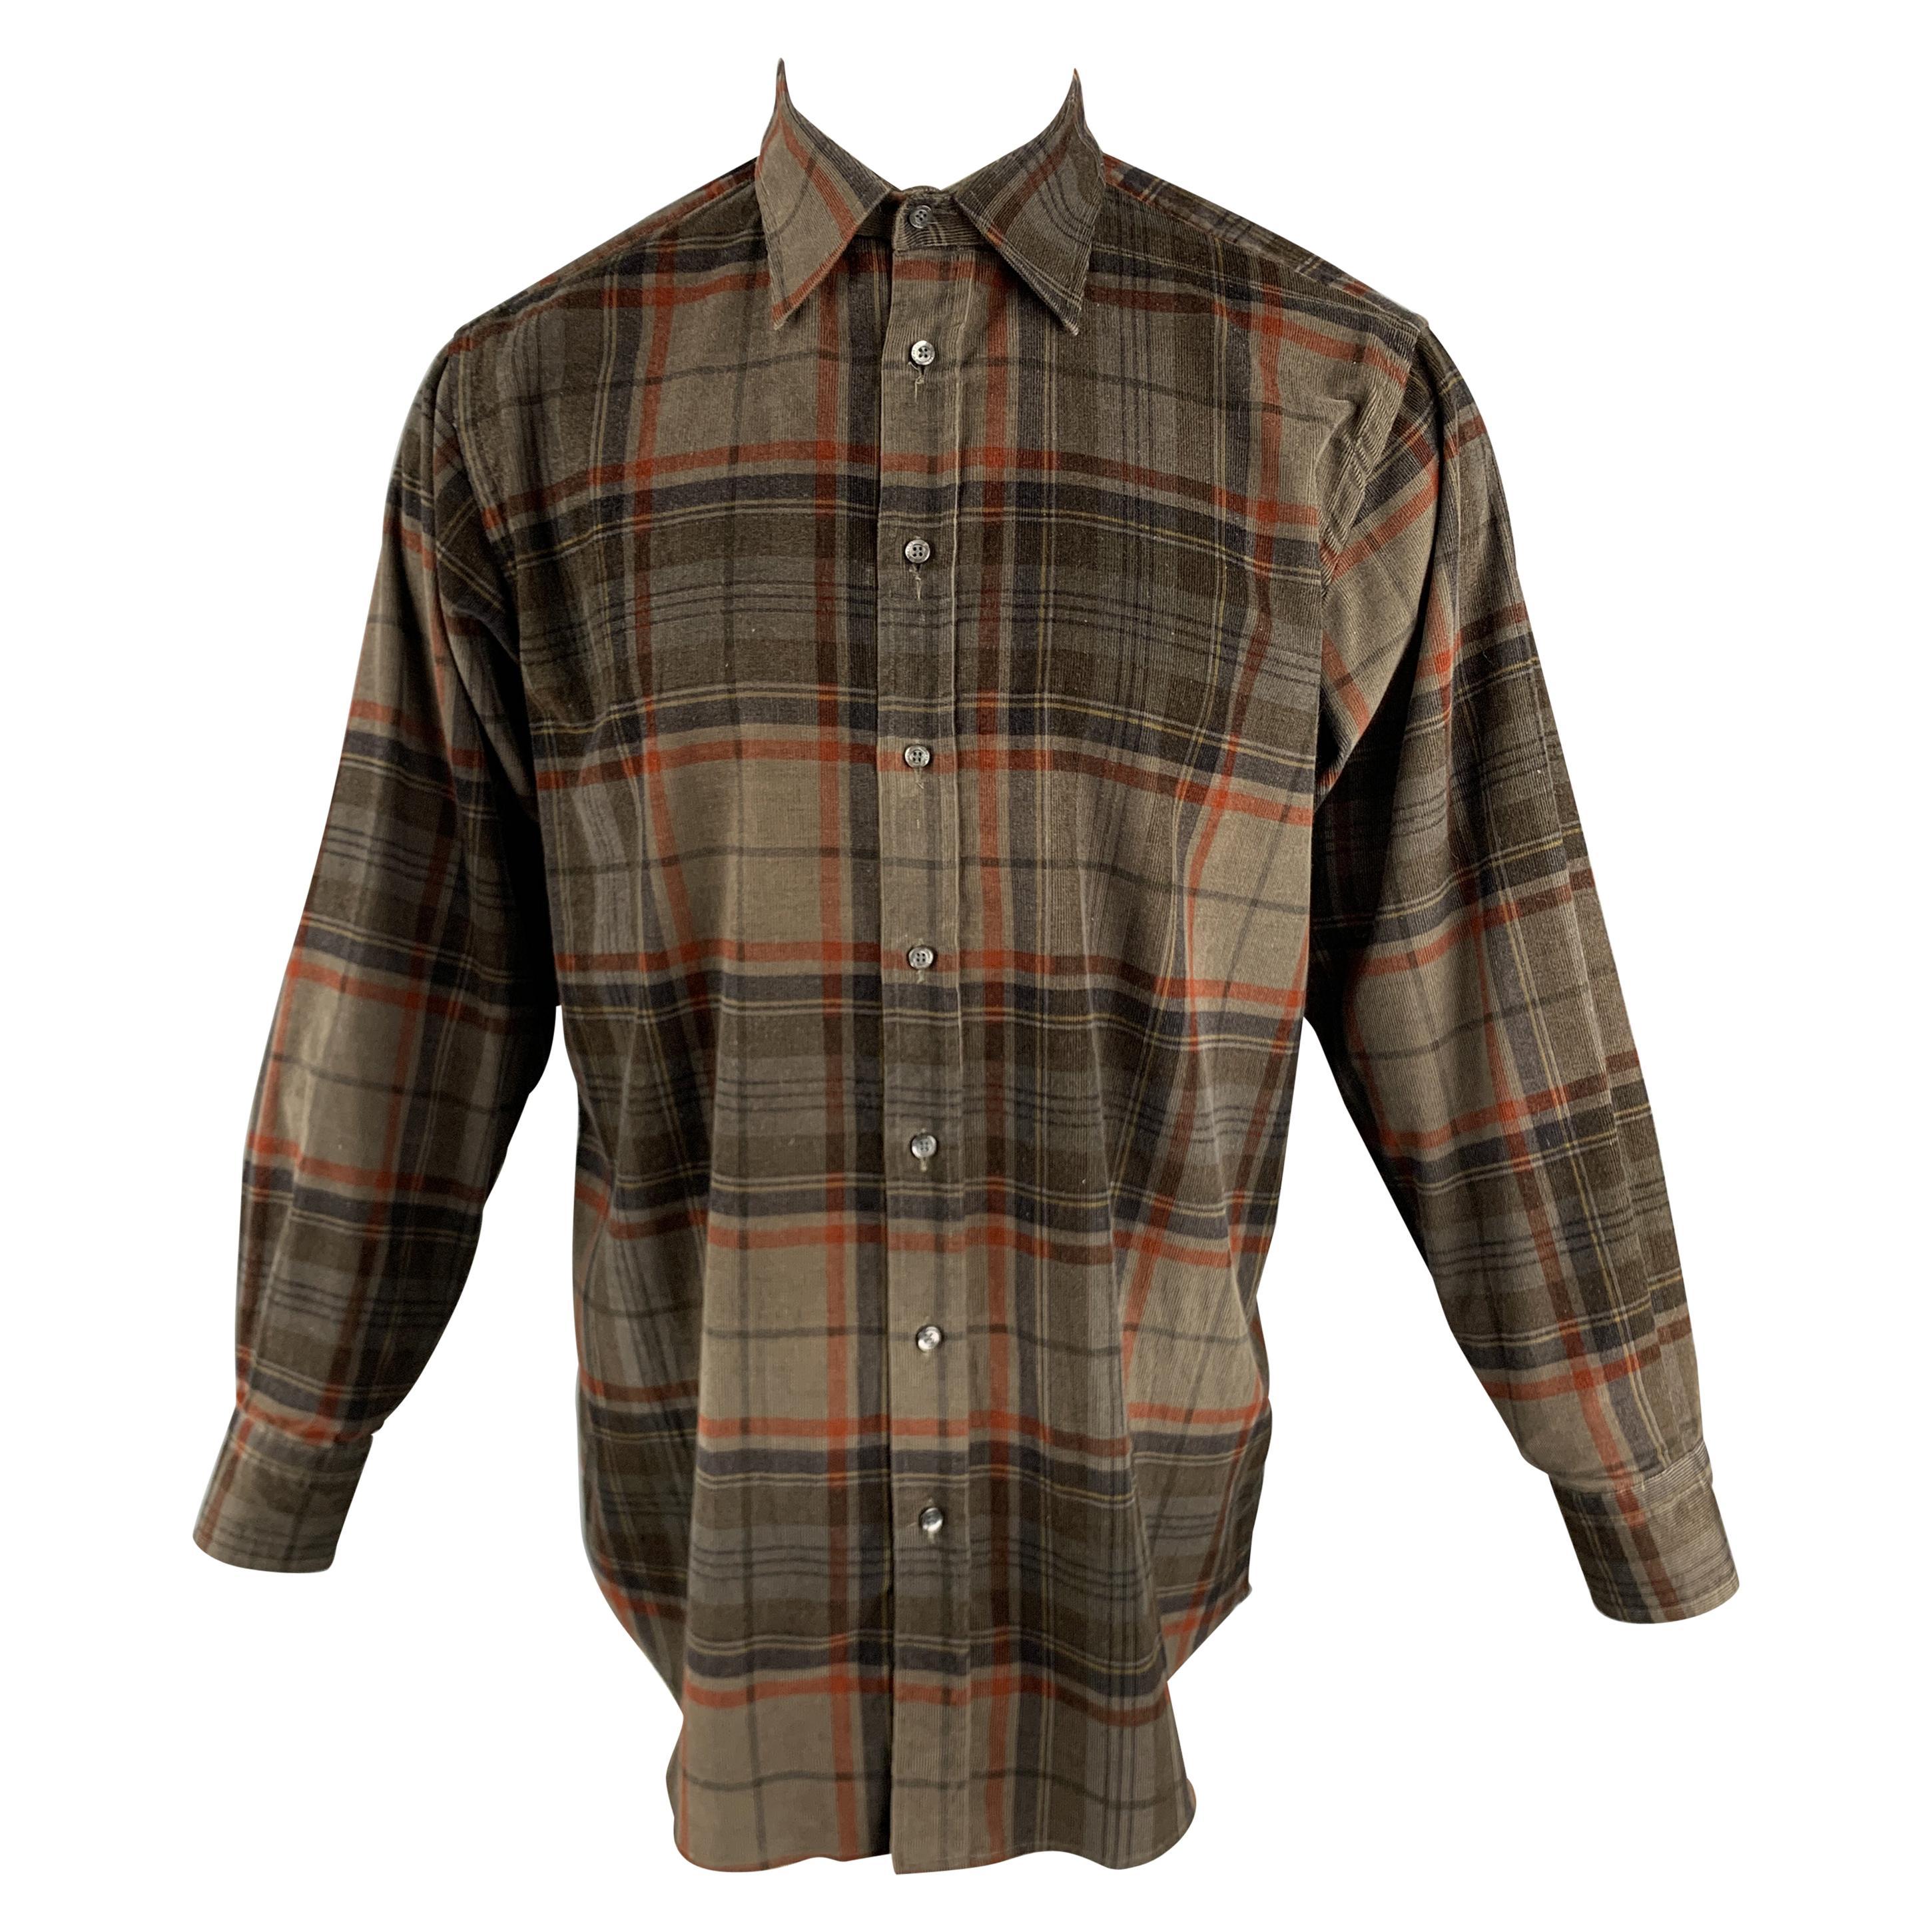 ETRO Size S Brown & Orange Plaid Corduroy Button Up Long Sleeve Shirt